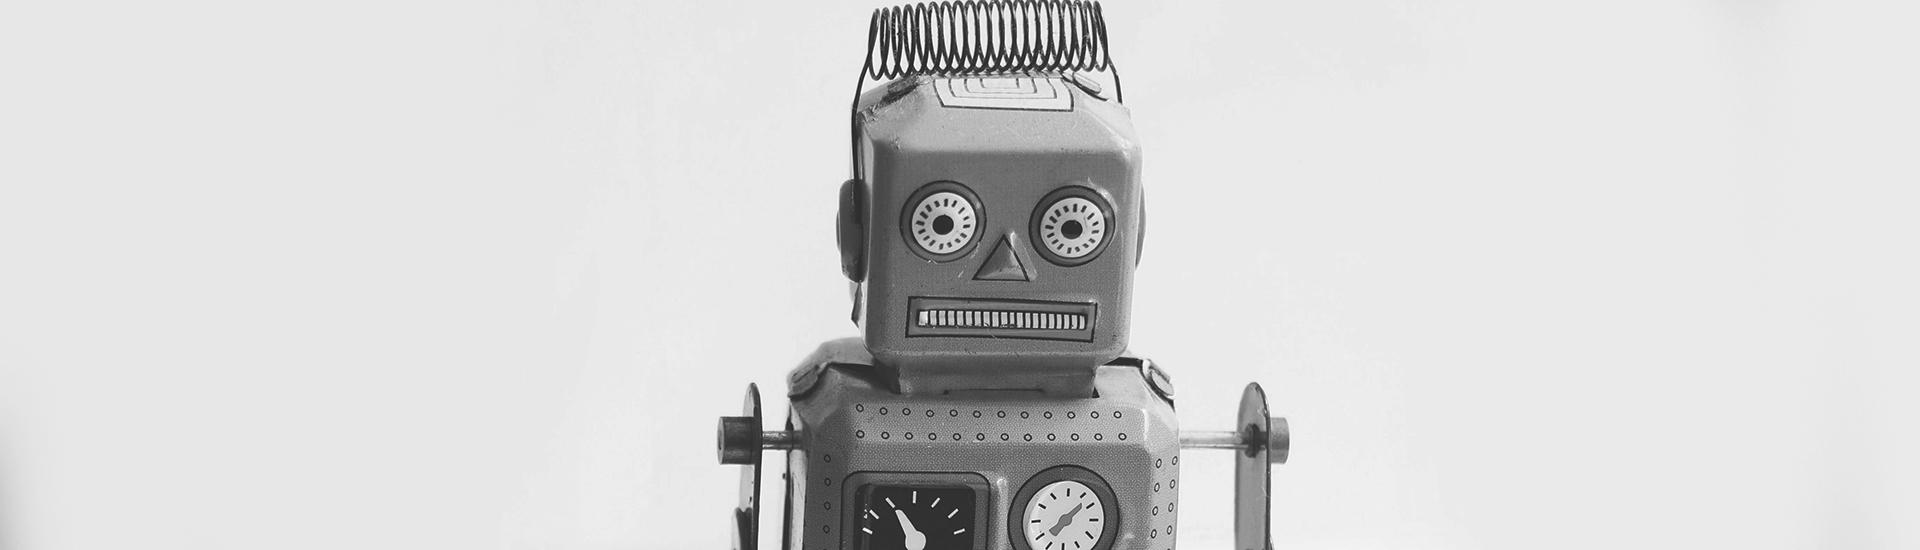 robot-future-tech